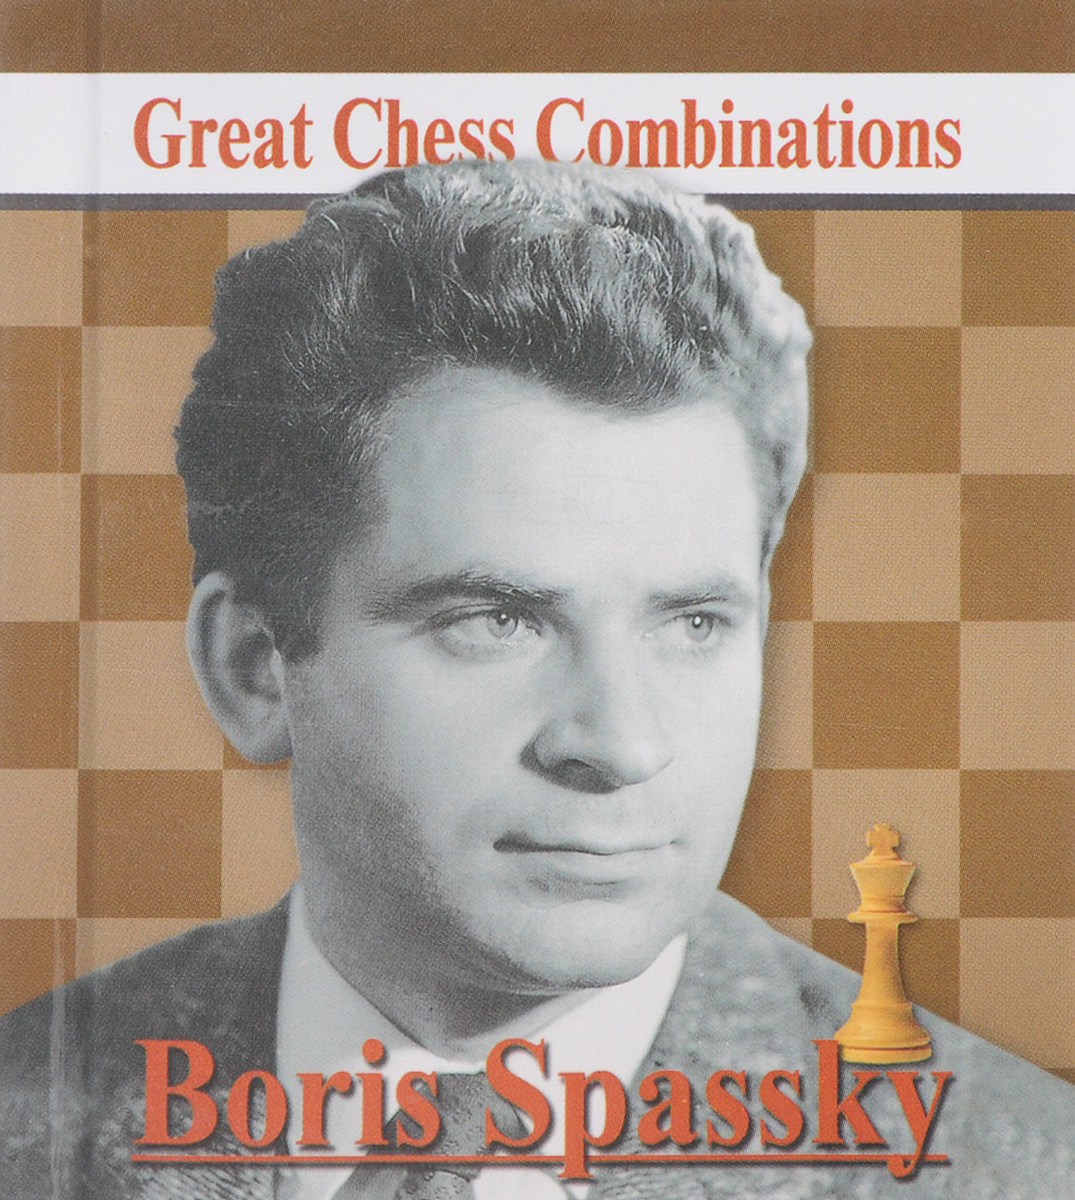 Boris Spassky: Great Chess Combinations / Борис Спасский. Лучшие шахматные комбинации (миниатюрное издание). Александр Калинин